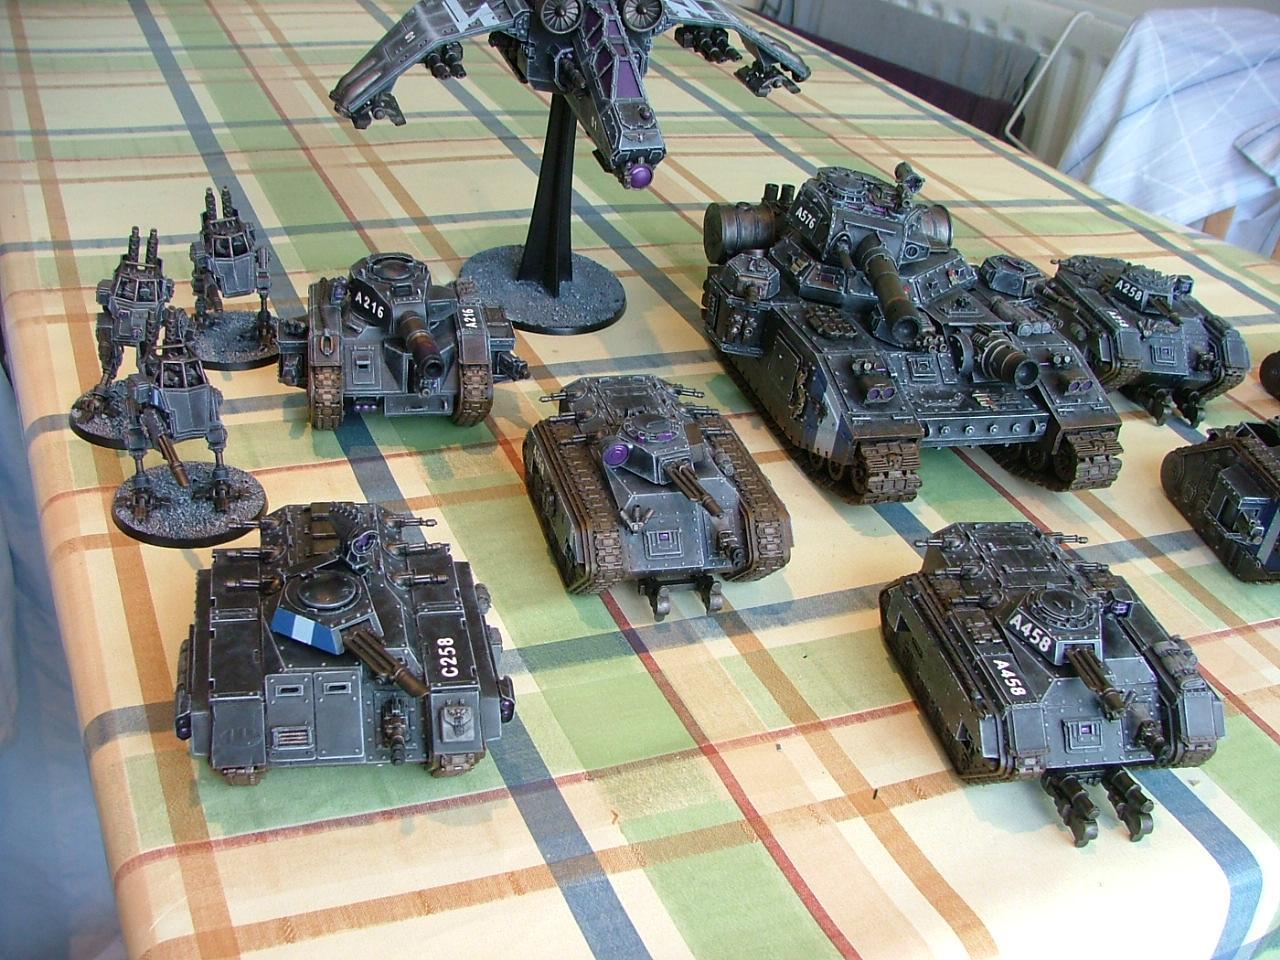 Baneblade, Chimera, Imperial Guard, Valkyrie